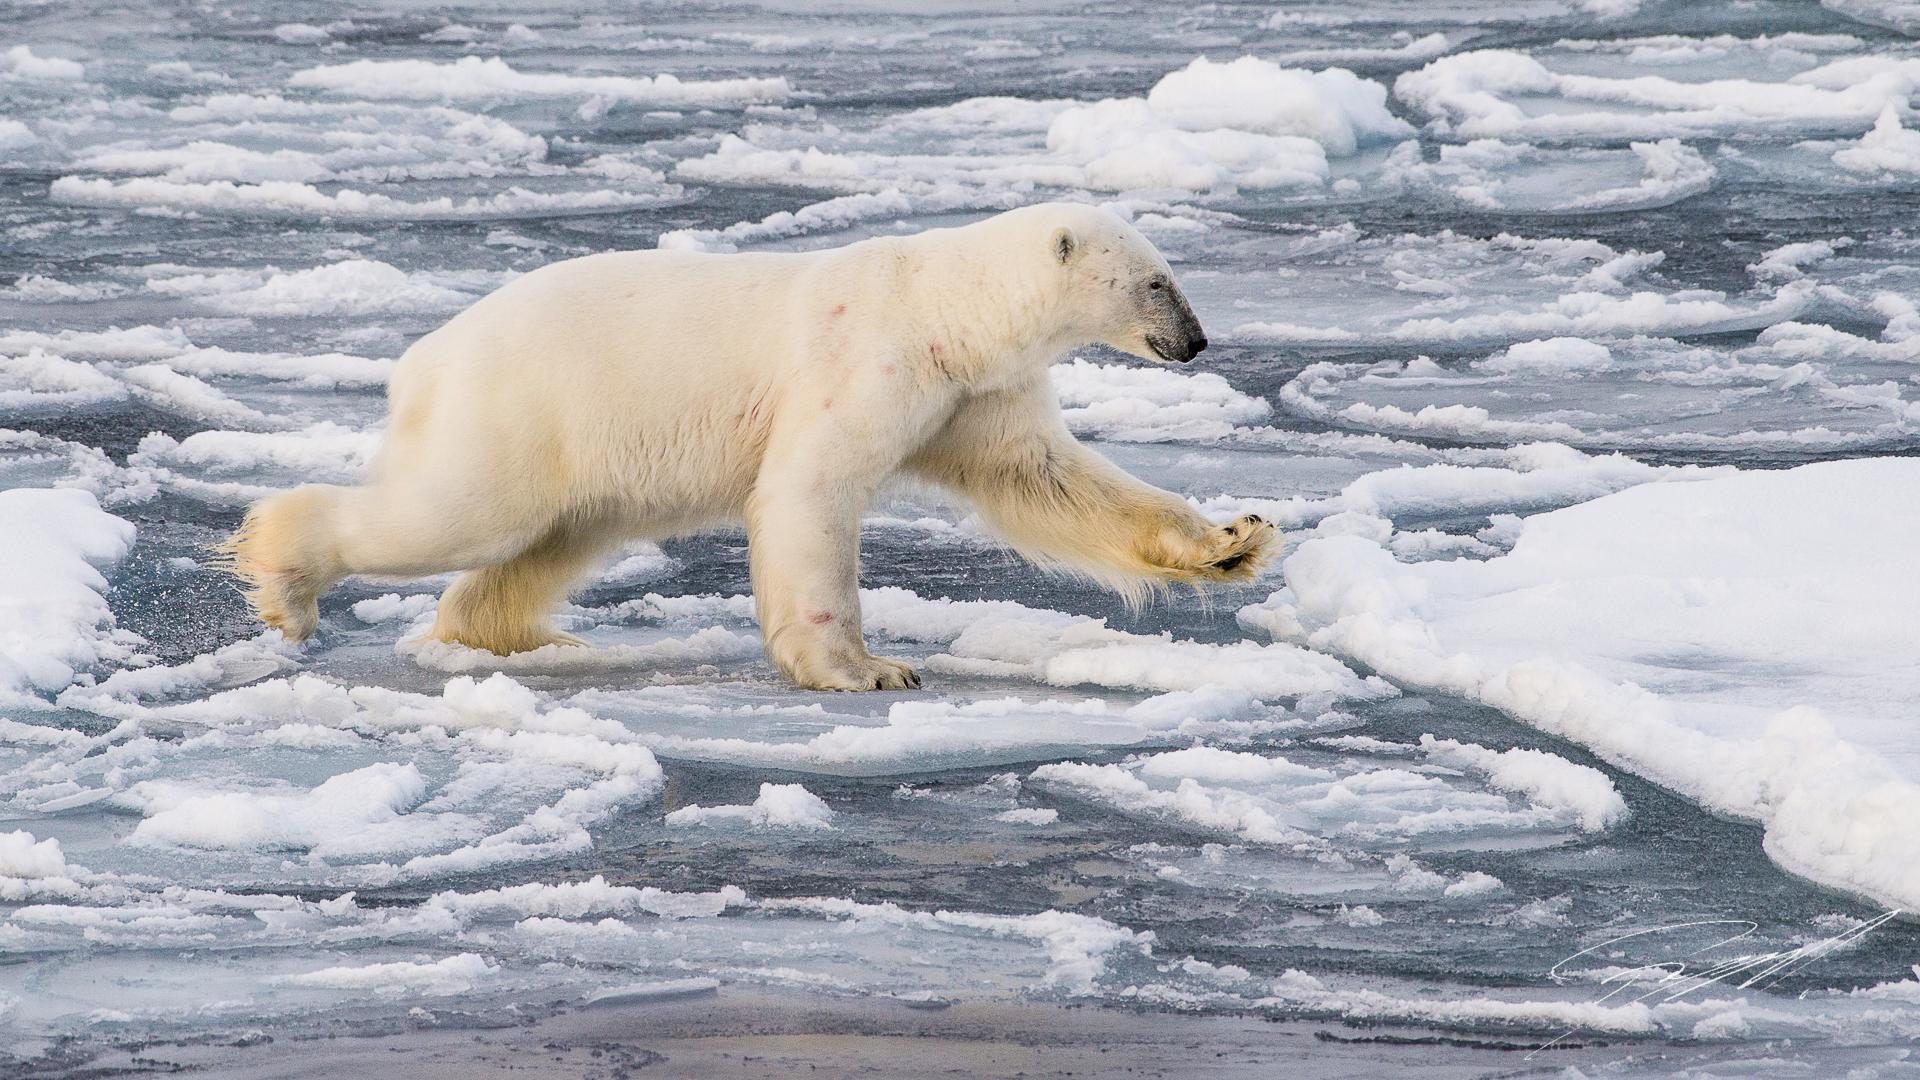 91af7c330b81 Polar bear north of Svalbard - Nikon D4s